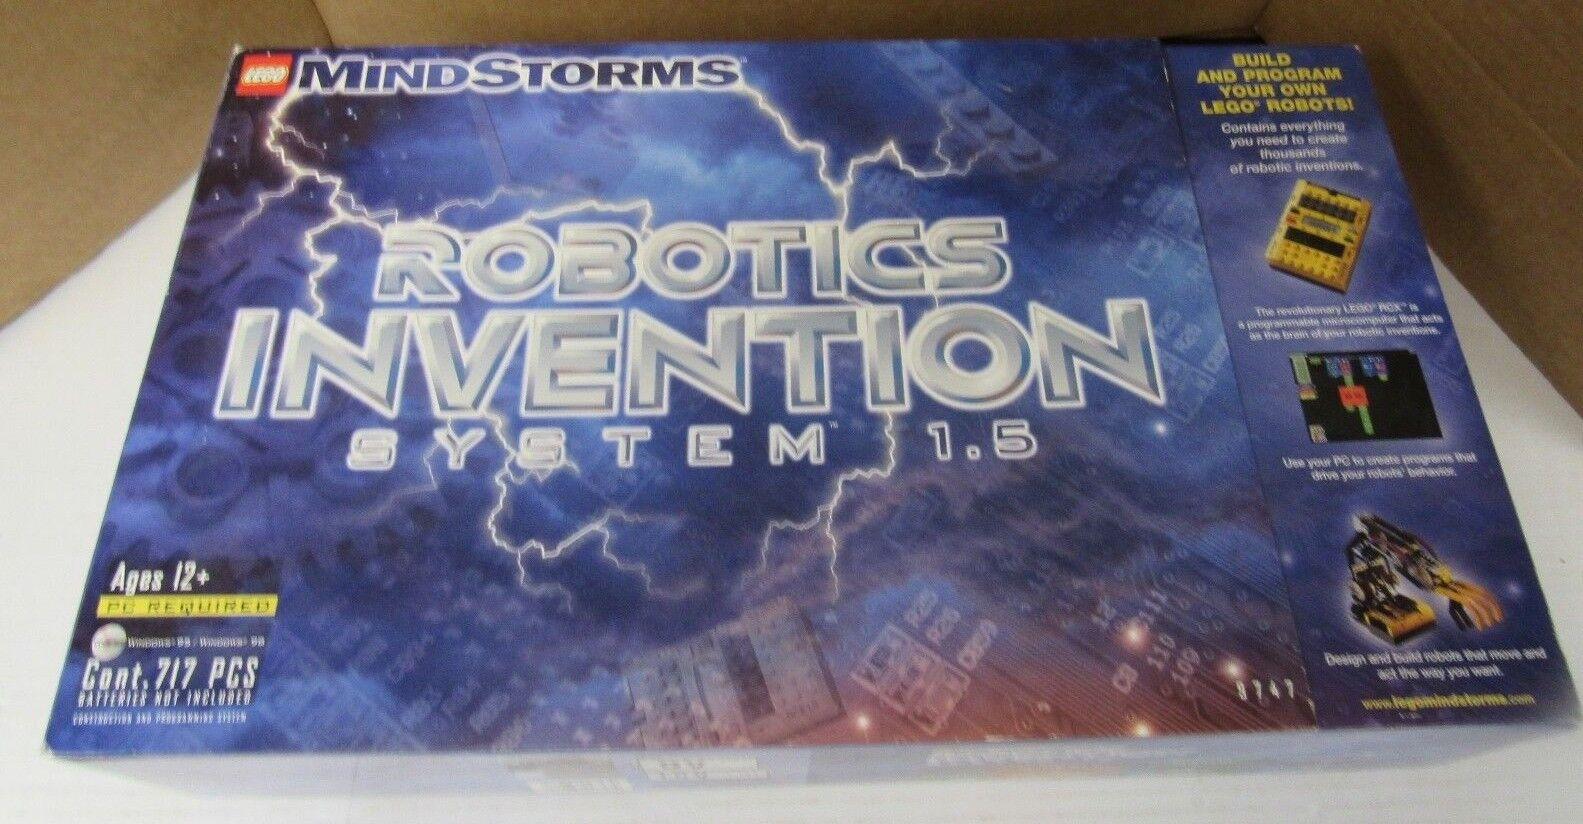 LEGO MINDSTORMS 9747 ROBOTICS SYSTEM SYSTEM SYSTEM 1.5 [55C] 6bfc72